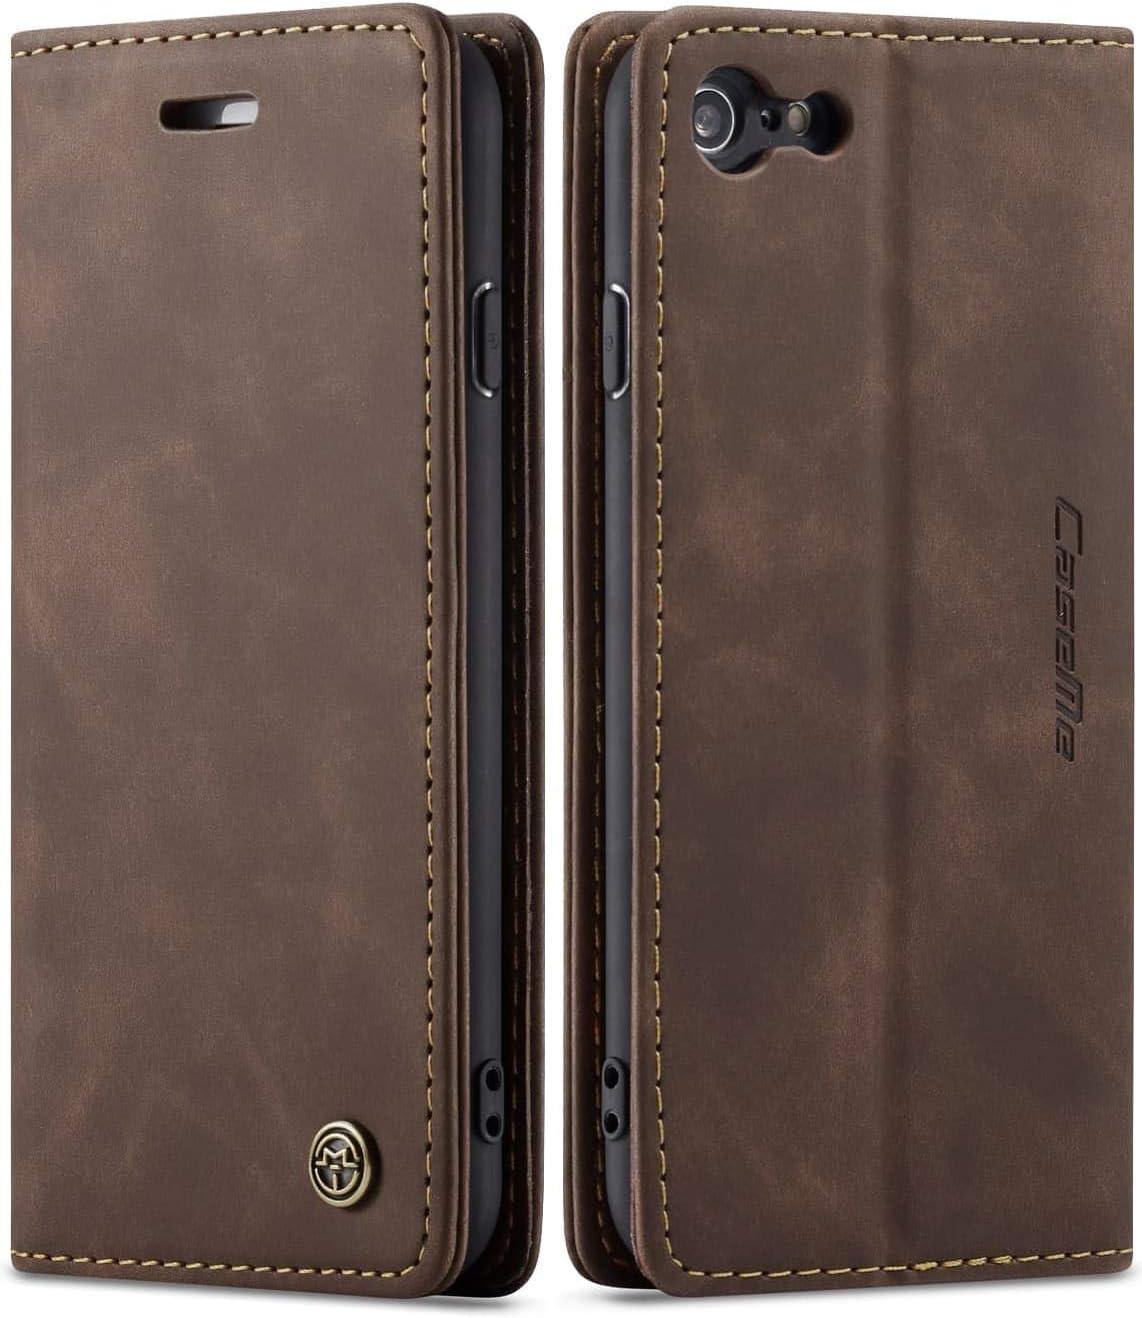 iPhone 6 Plus Wallet Case iPhone 6S Plus Leather Case, SINIANL Folio Case with Kickstand Credit Card Holder Magnetic Closure Folding Flip Book Cover Case for iPhone 6 Plus iPhone 6S Plus - Coffee